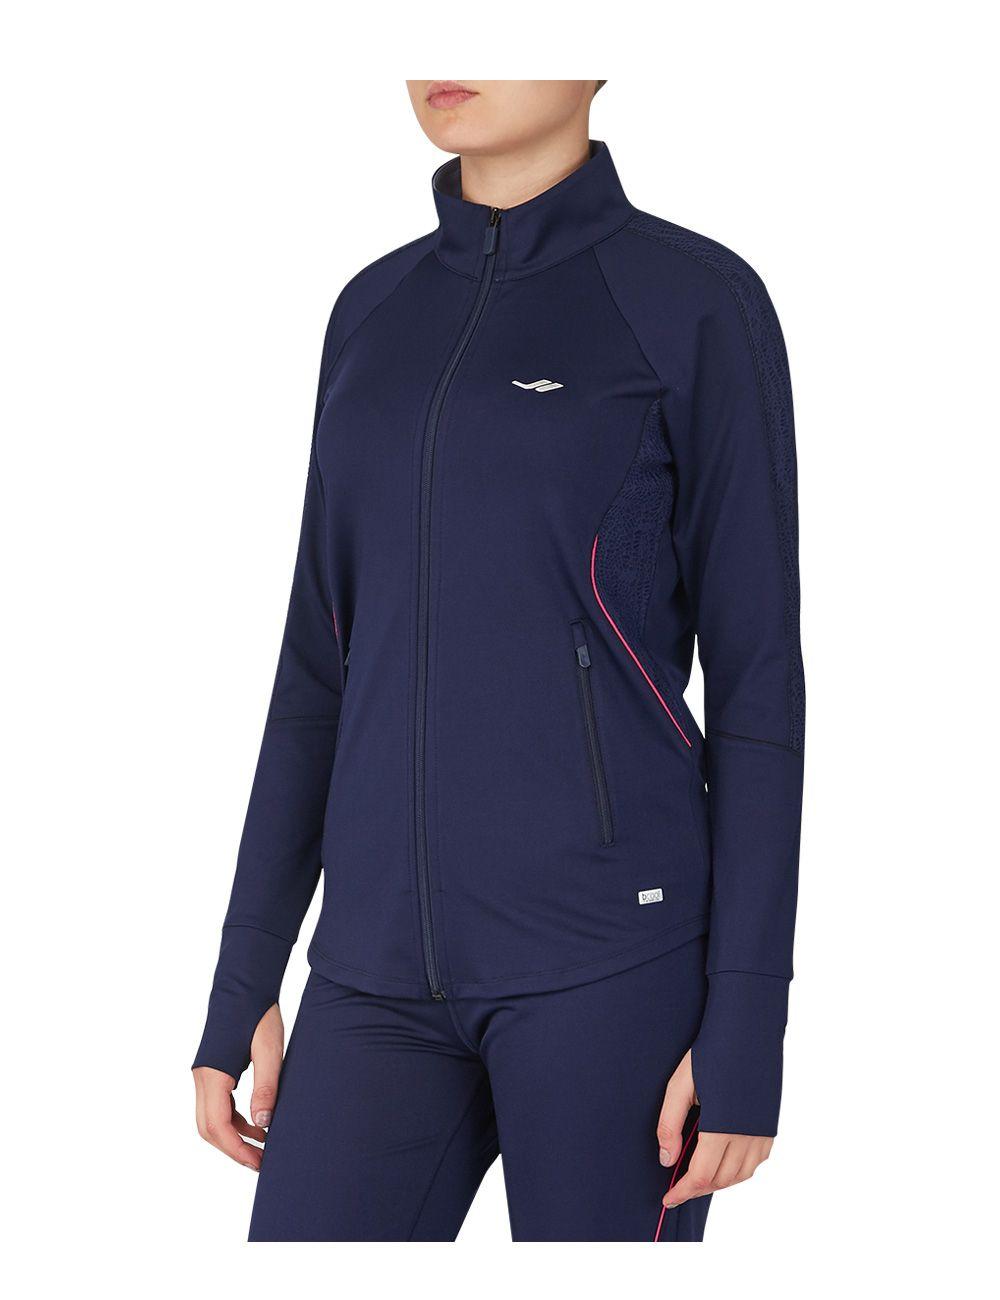 Lescon 17b 2027 Sweatshirt Spor Giyim Siyah Kapusonlu